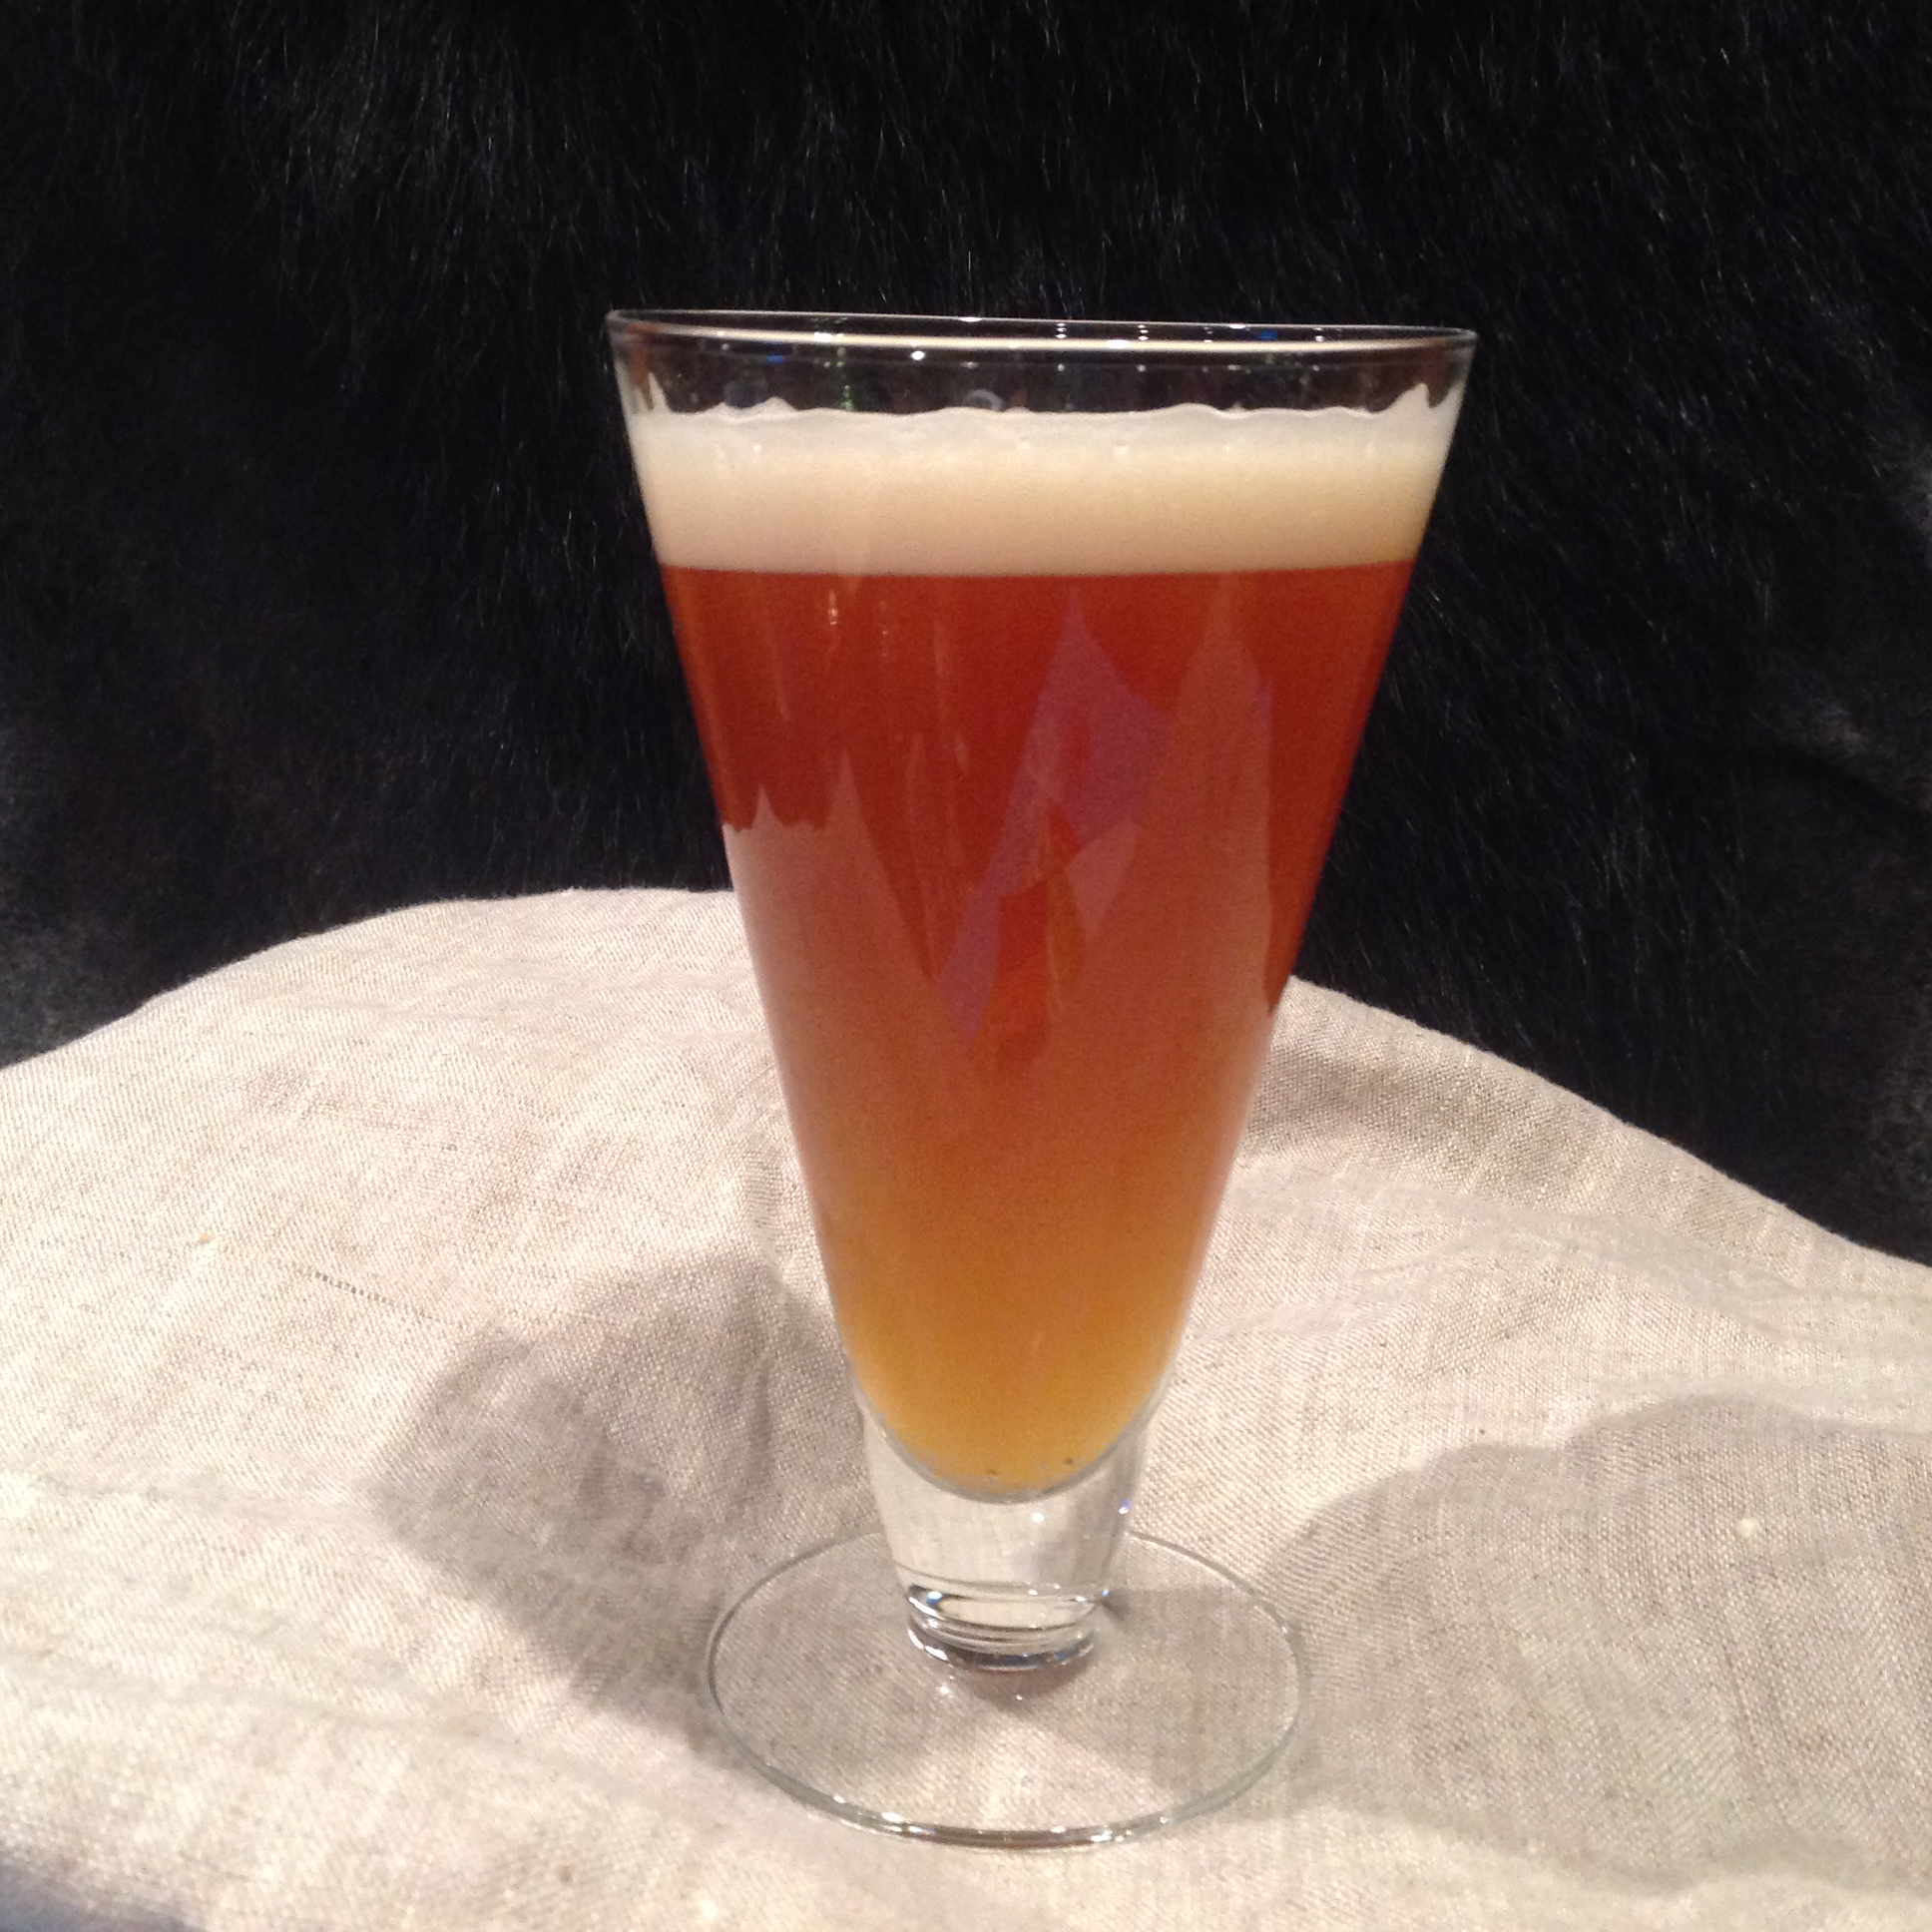 Bragi's Braggot – My recent fermentation experiement